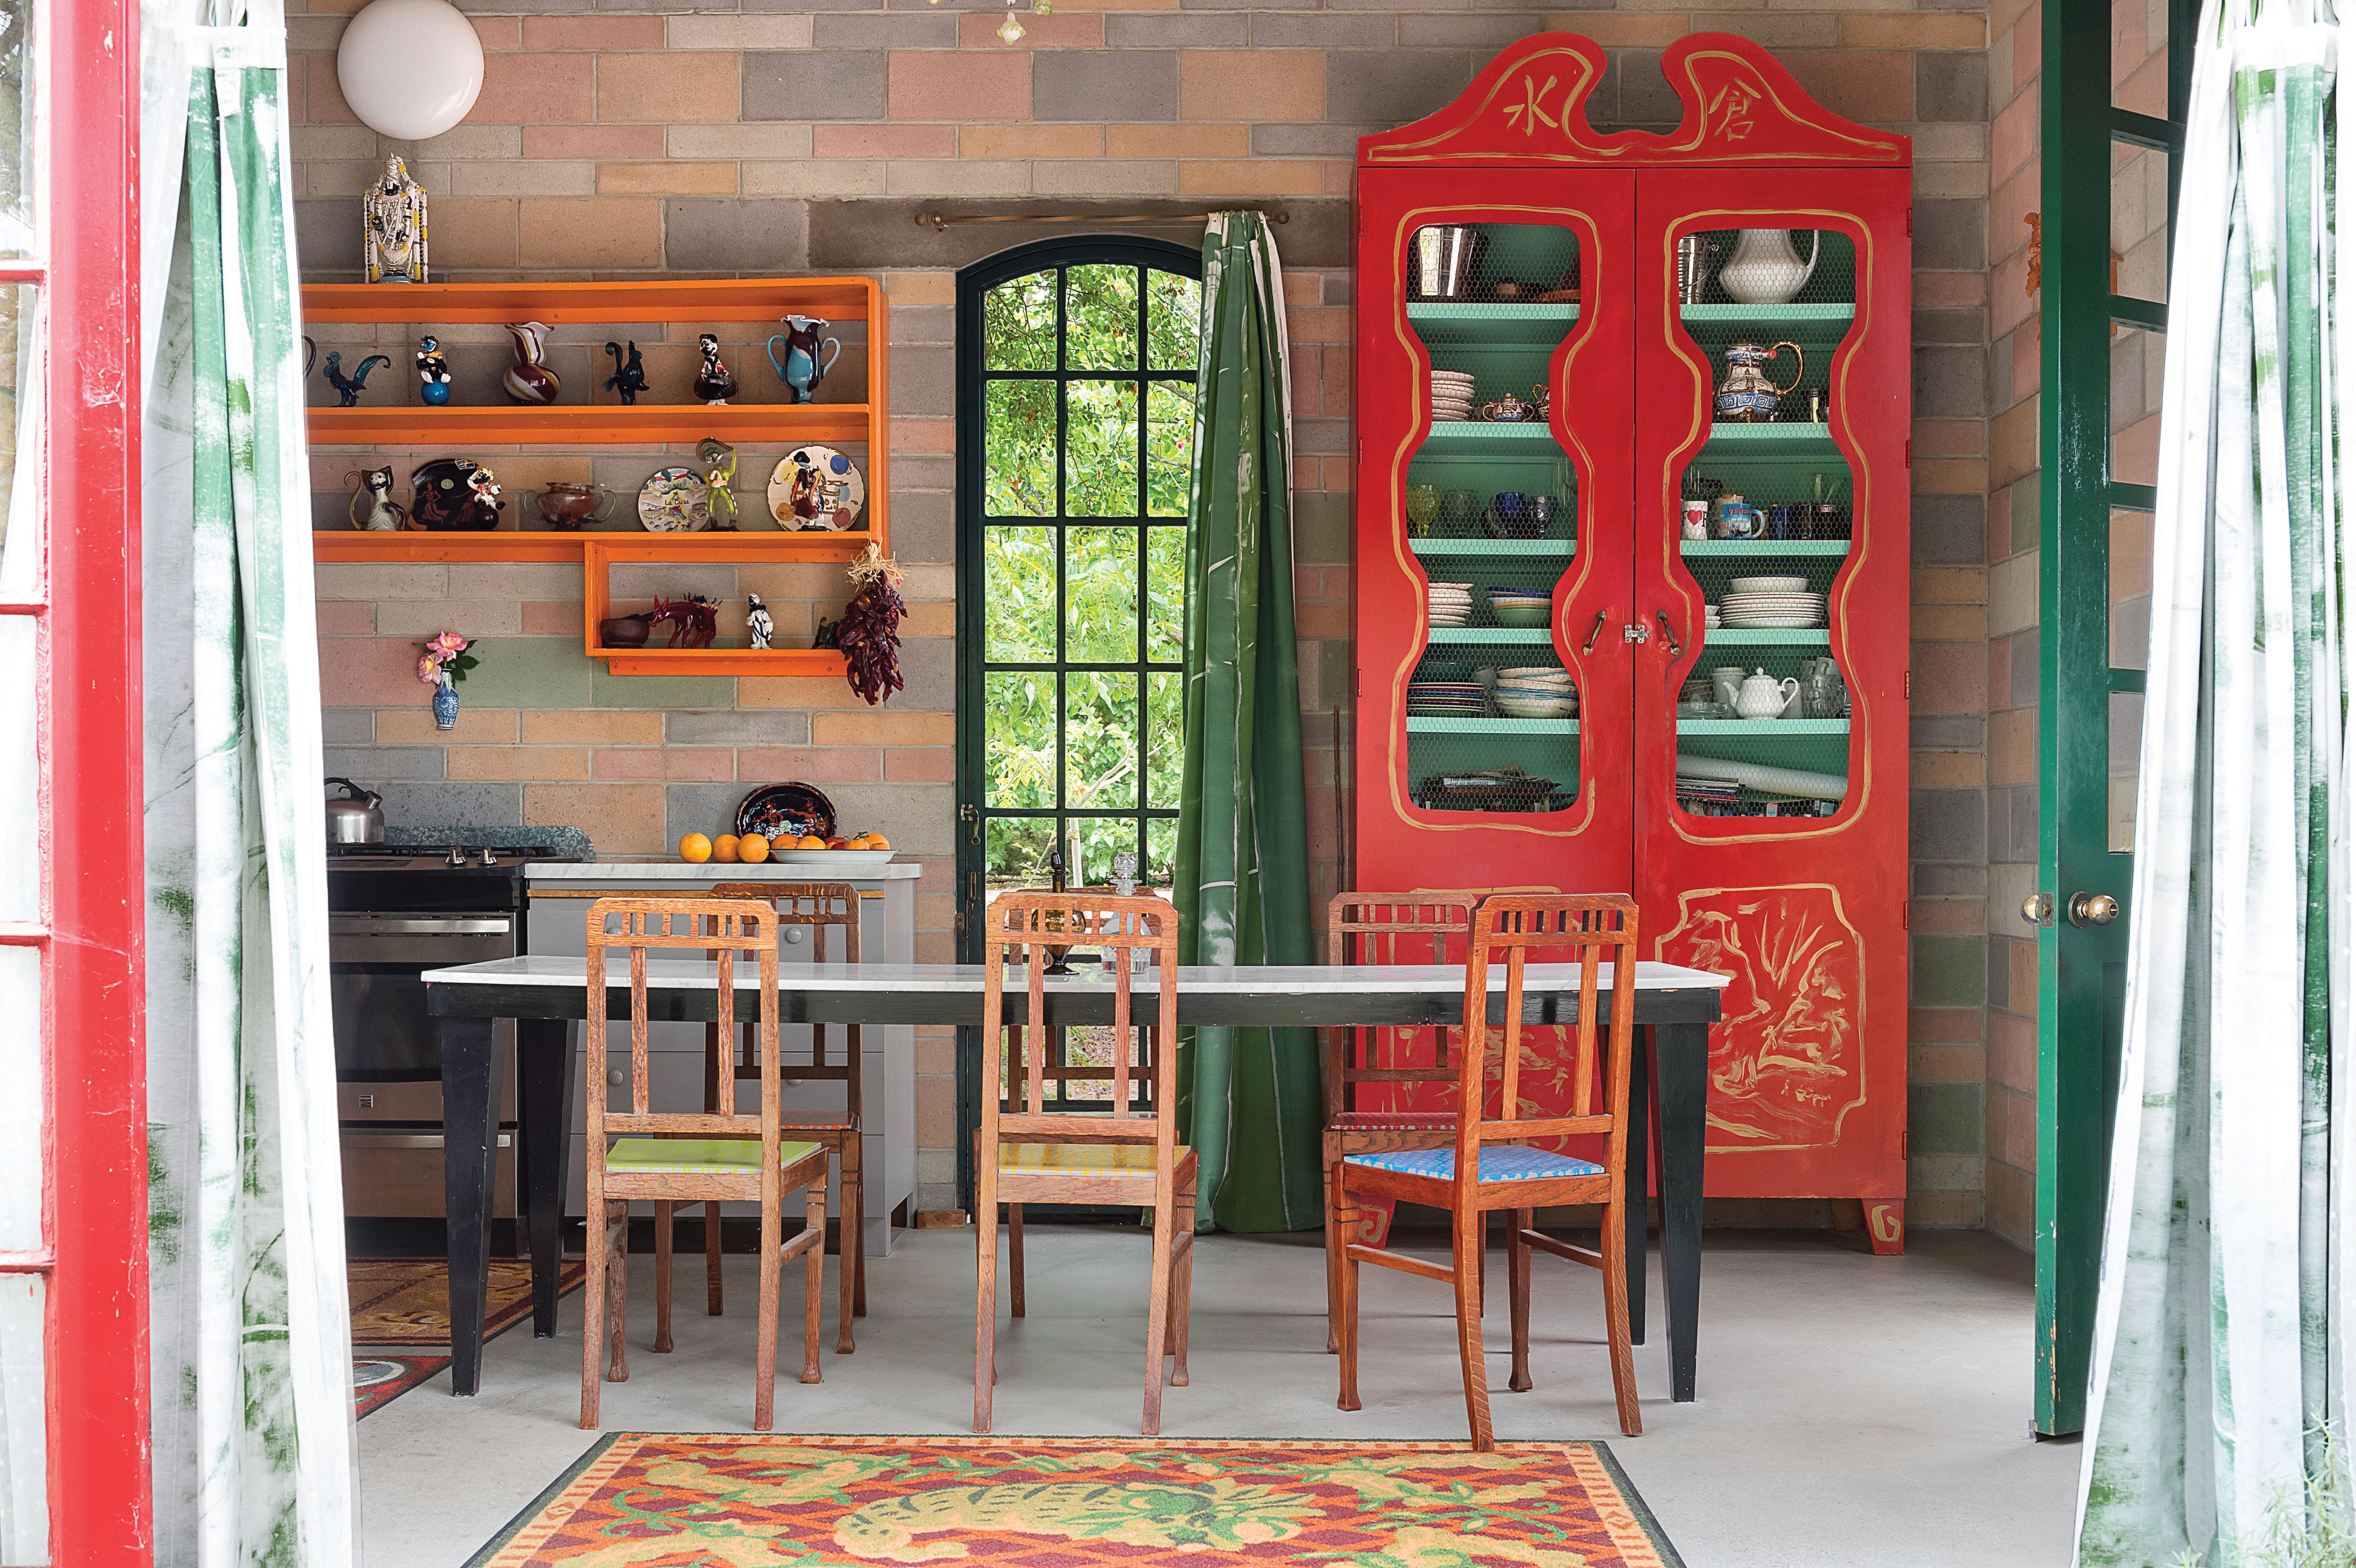 jean lowe and kim macconnel artists art san diego home kitchen salvaged wood